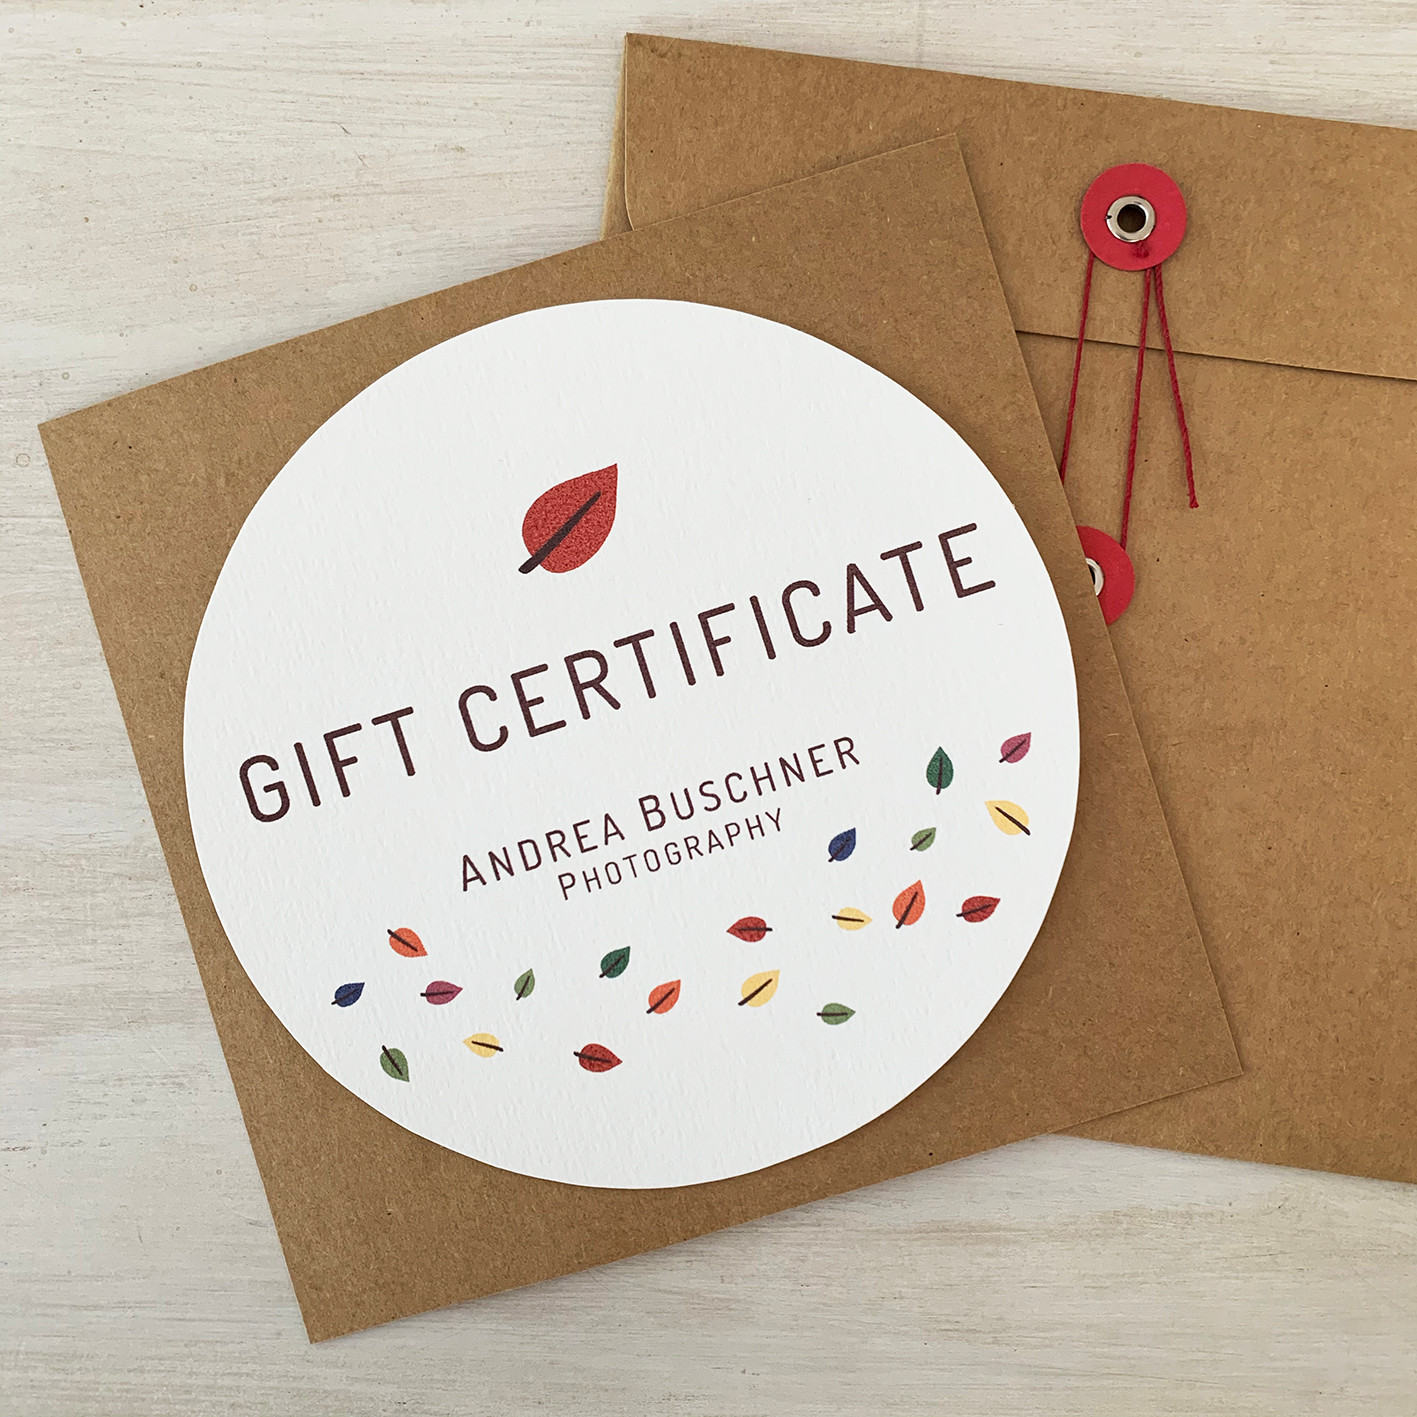 Branded Gift Certificate